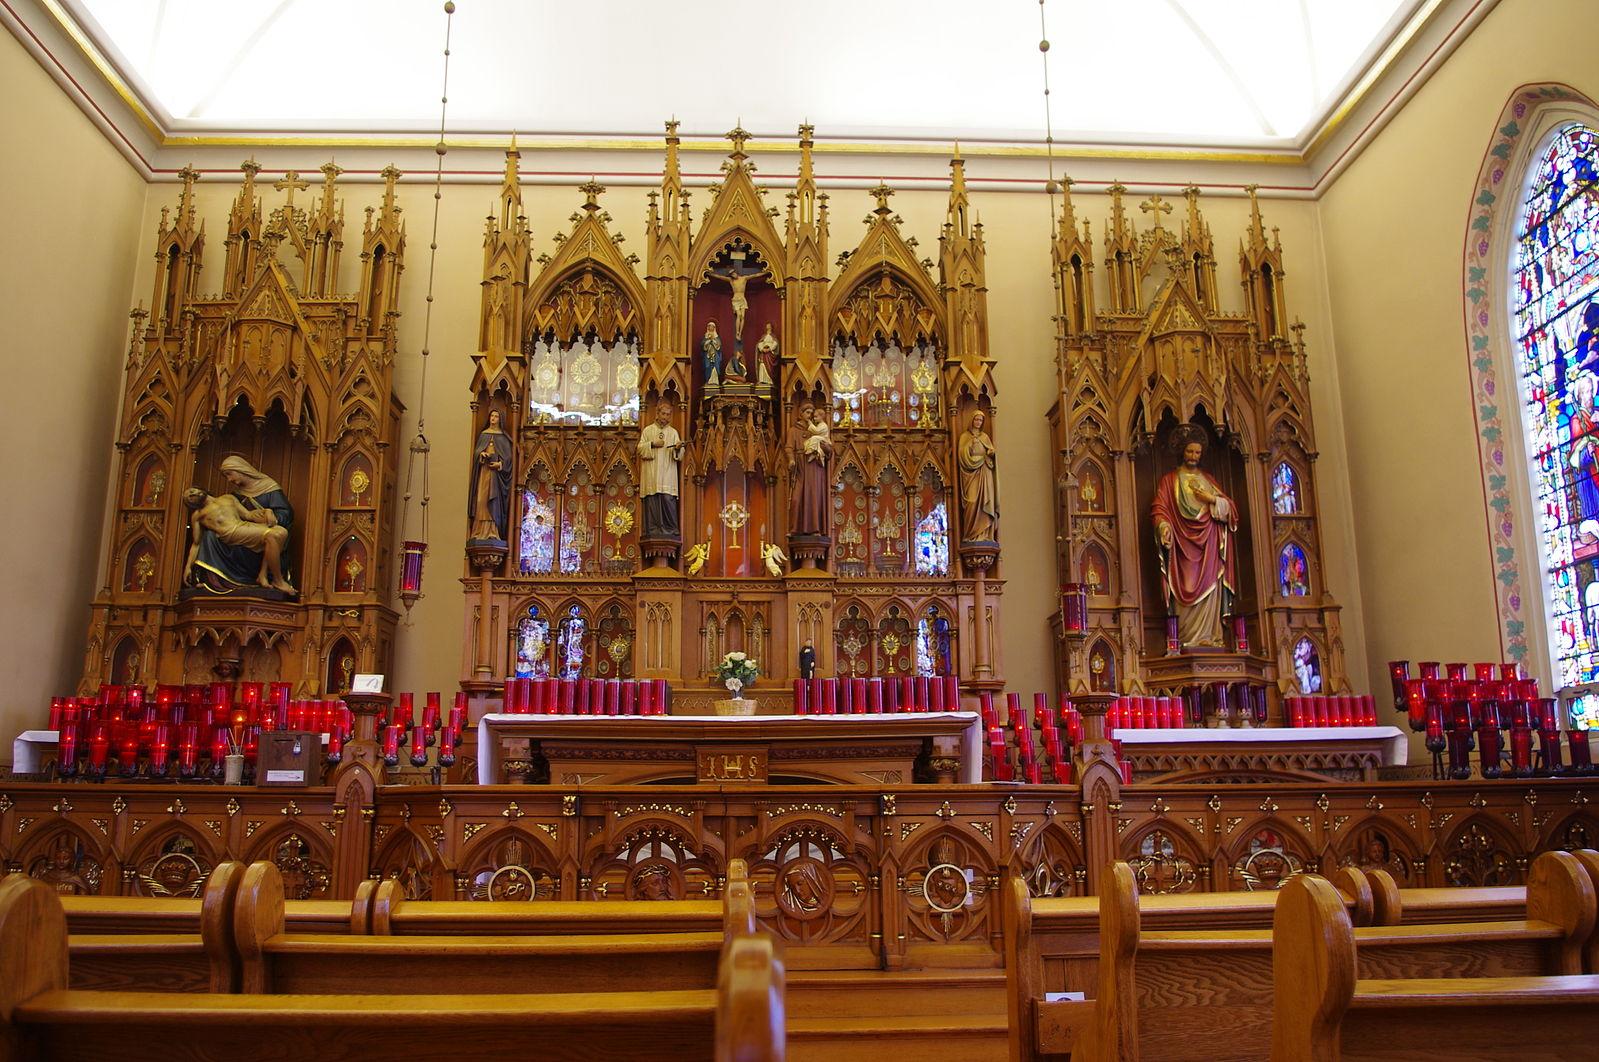 Main Altar at the Maria Stein Shrine  Photo by Nheyob/CCA-SA 3.0